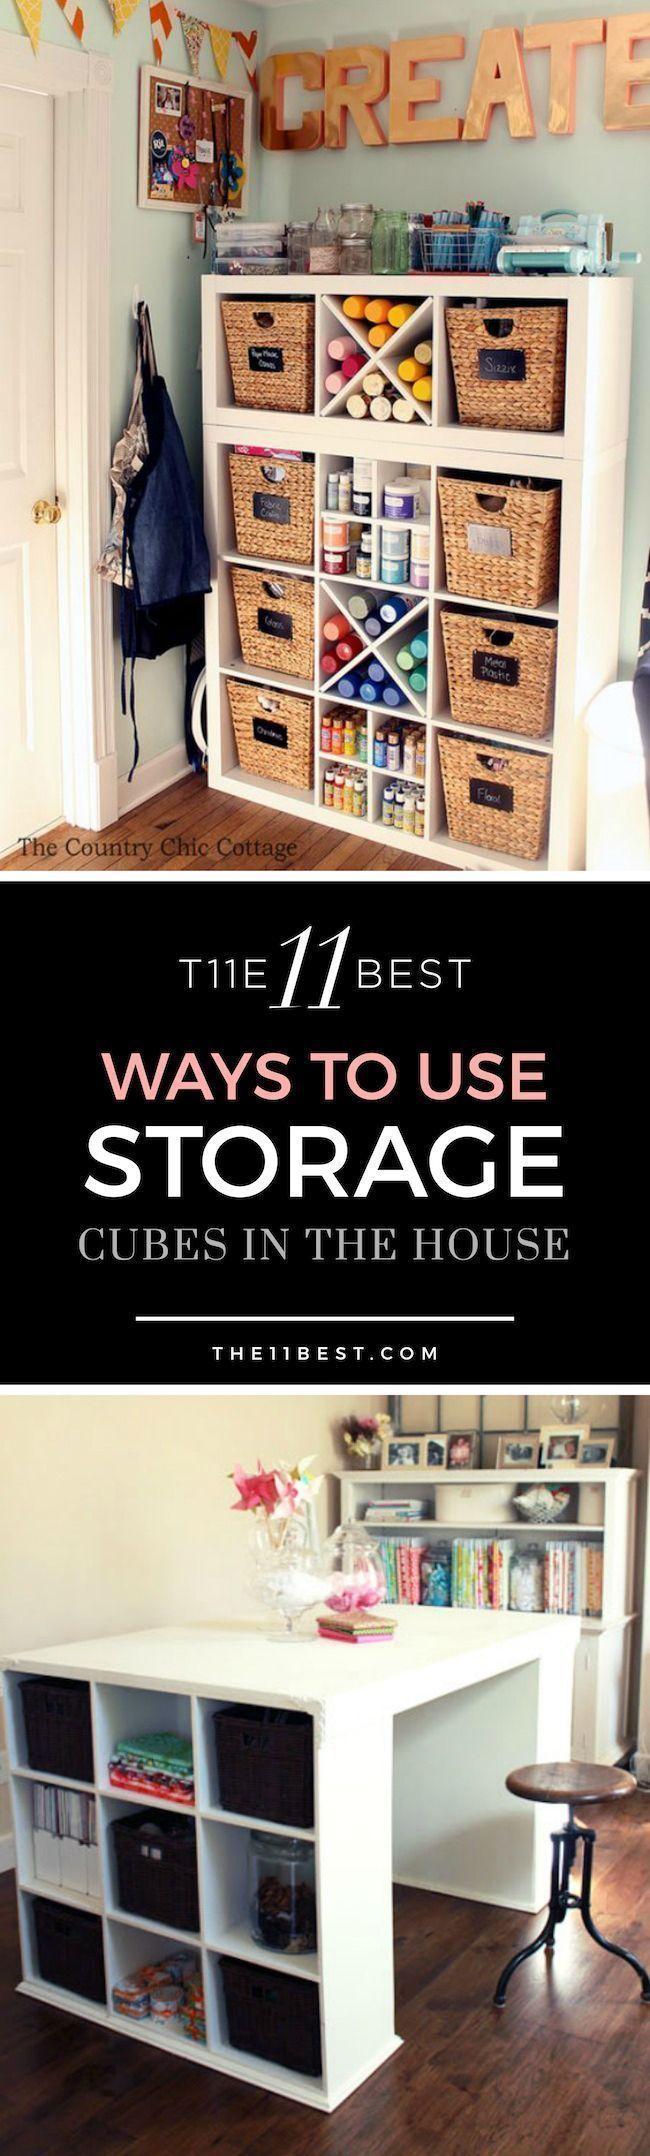 The 11 Best Ways to Use Storage